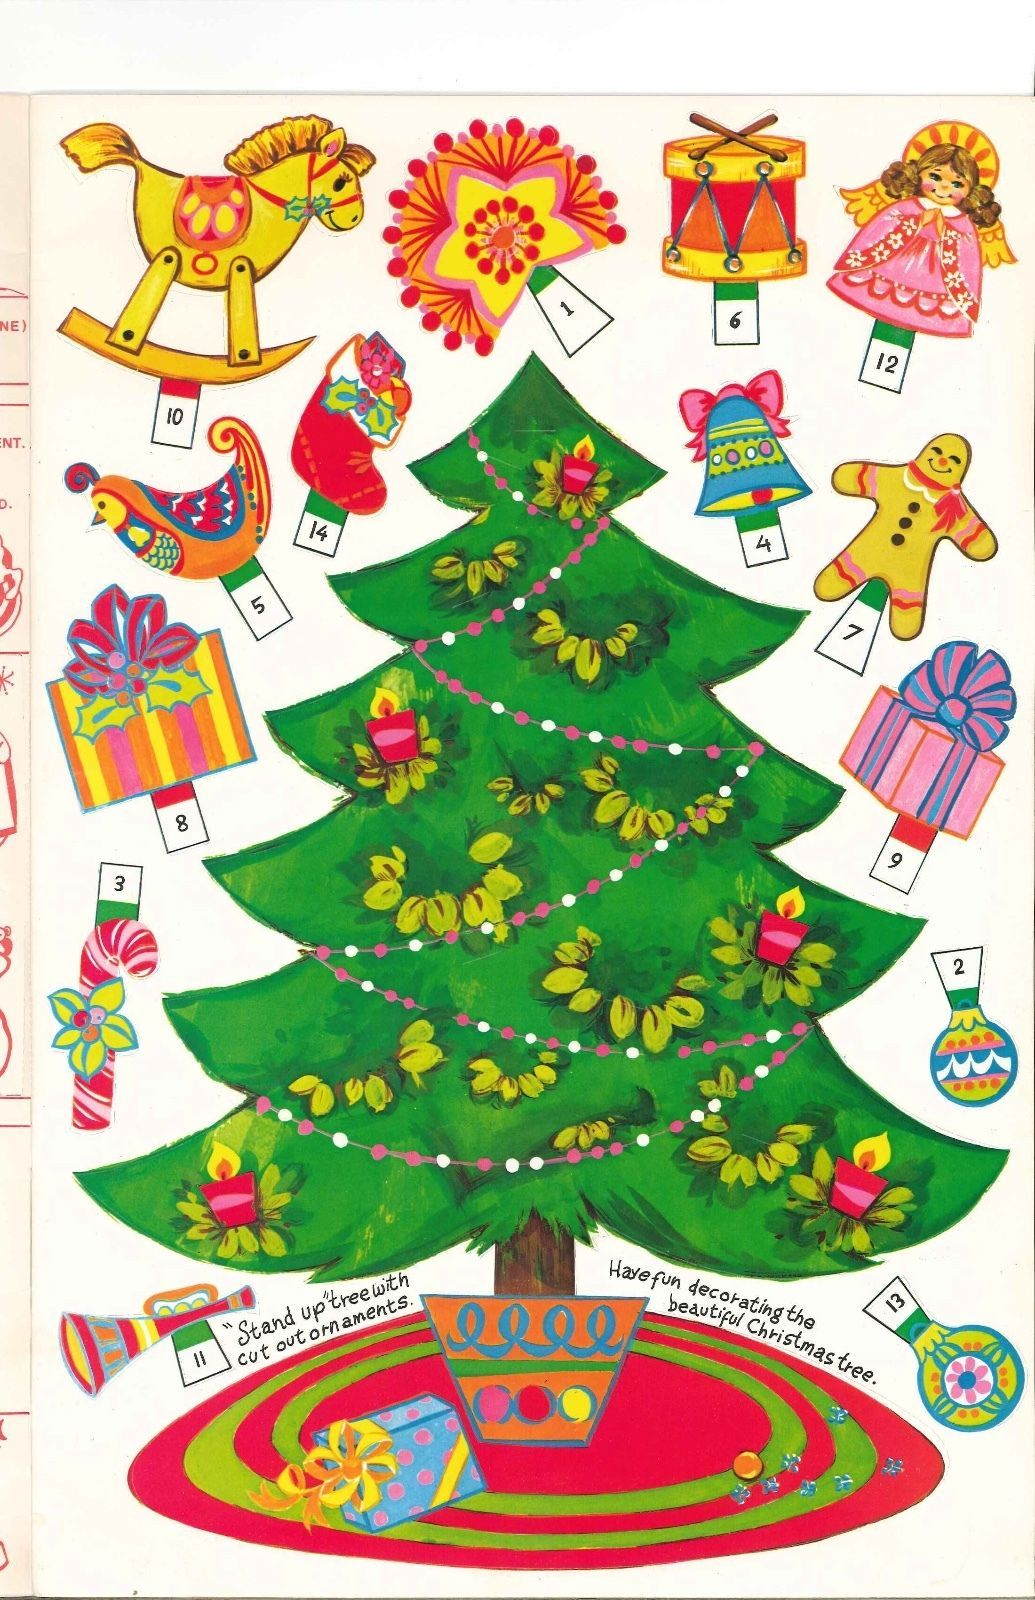 Vintage Uncut 1960s Christmas Playbook Paper Doll Orig Sz Laser Reproduction Paper Dolls Christmas Paper Crafts Christmas Paper